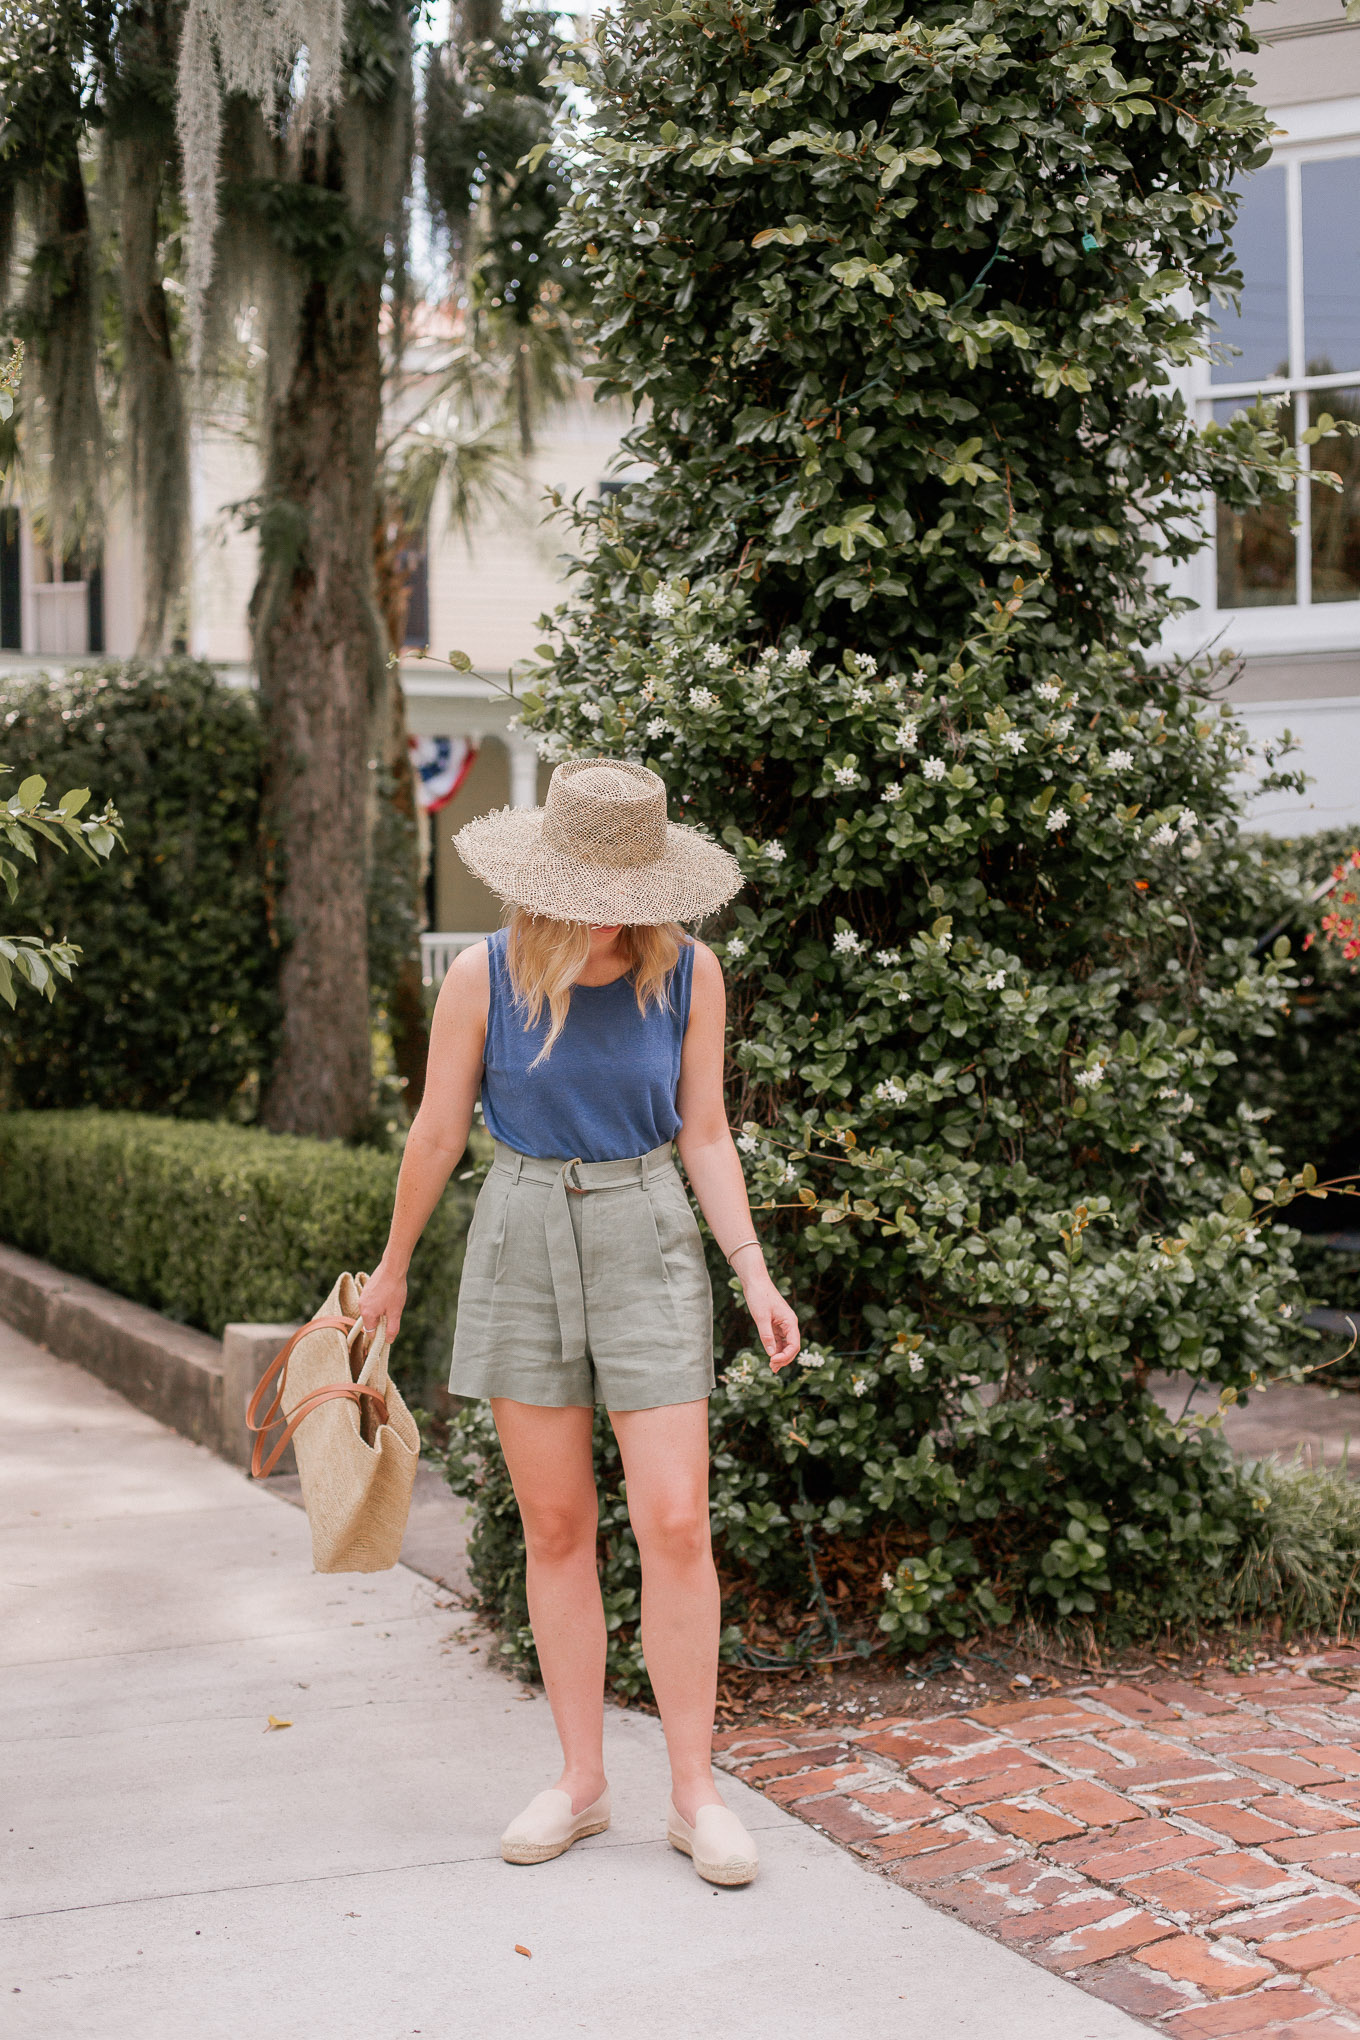 Recent Looks JuNE 2020: Linen Tank, Linen Shorts, Wide Brim Woven Hat   Louella Reese